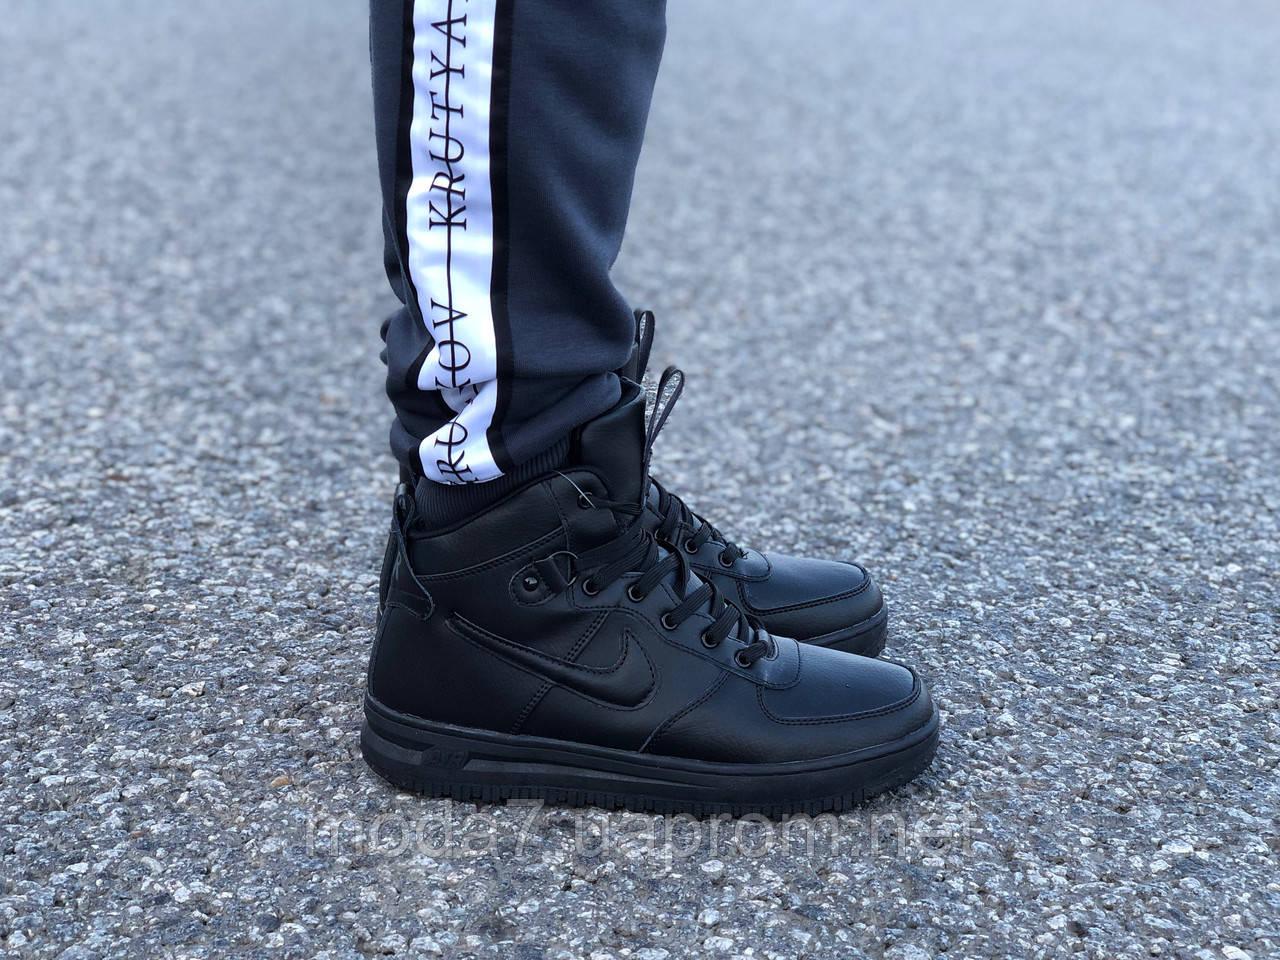 Мужские зимние кроссовки Nike Air Force реплика